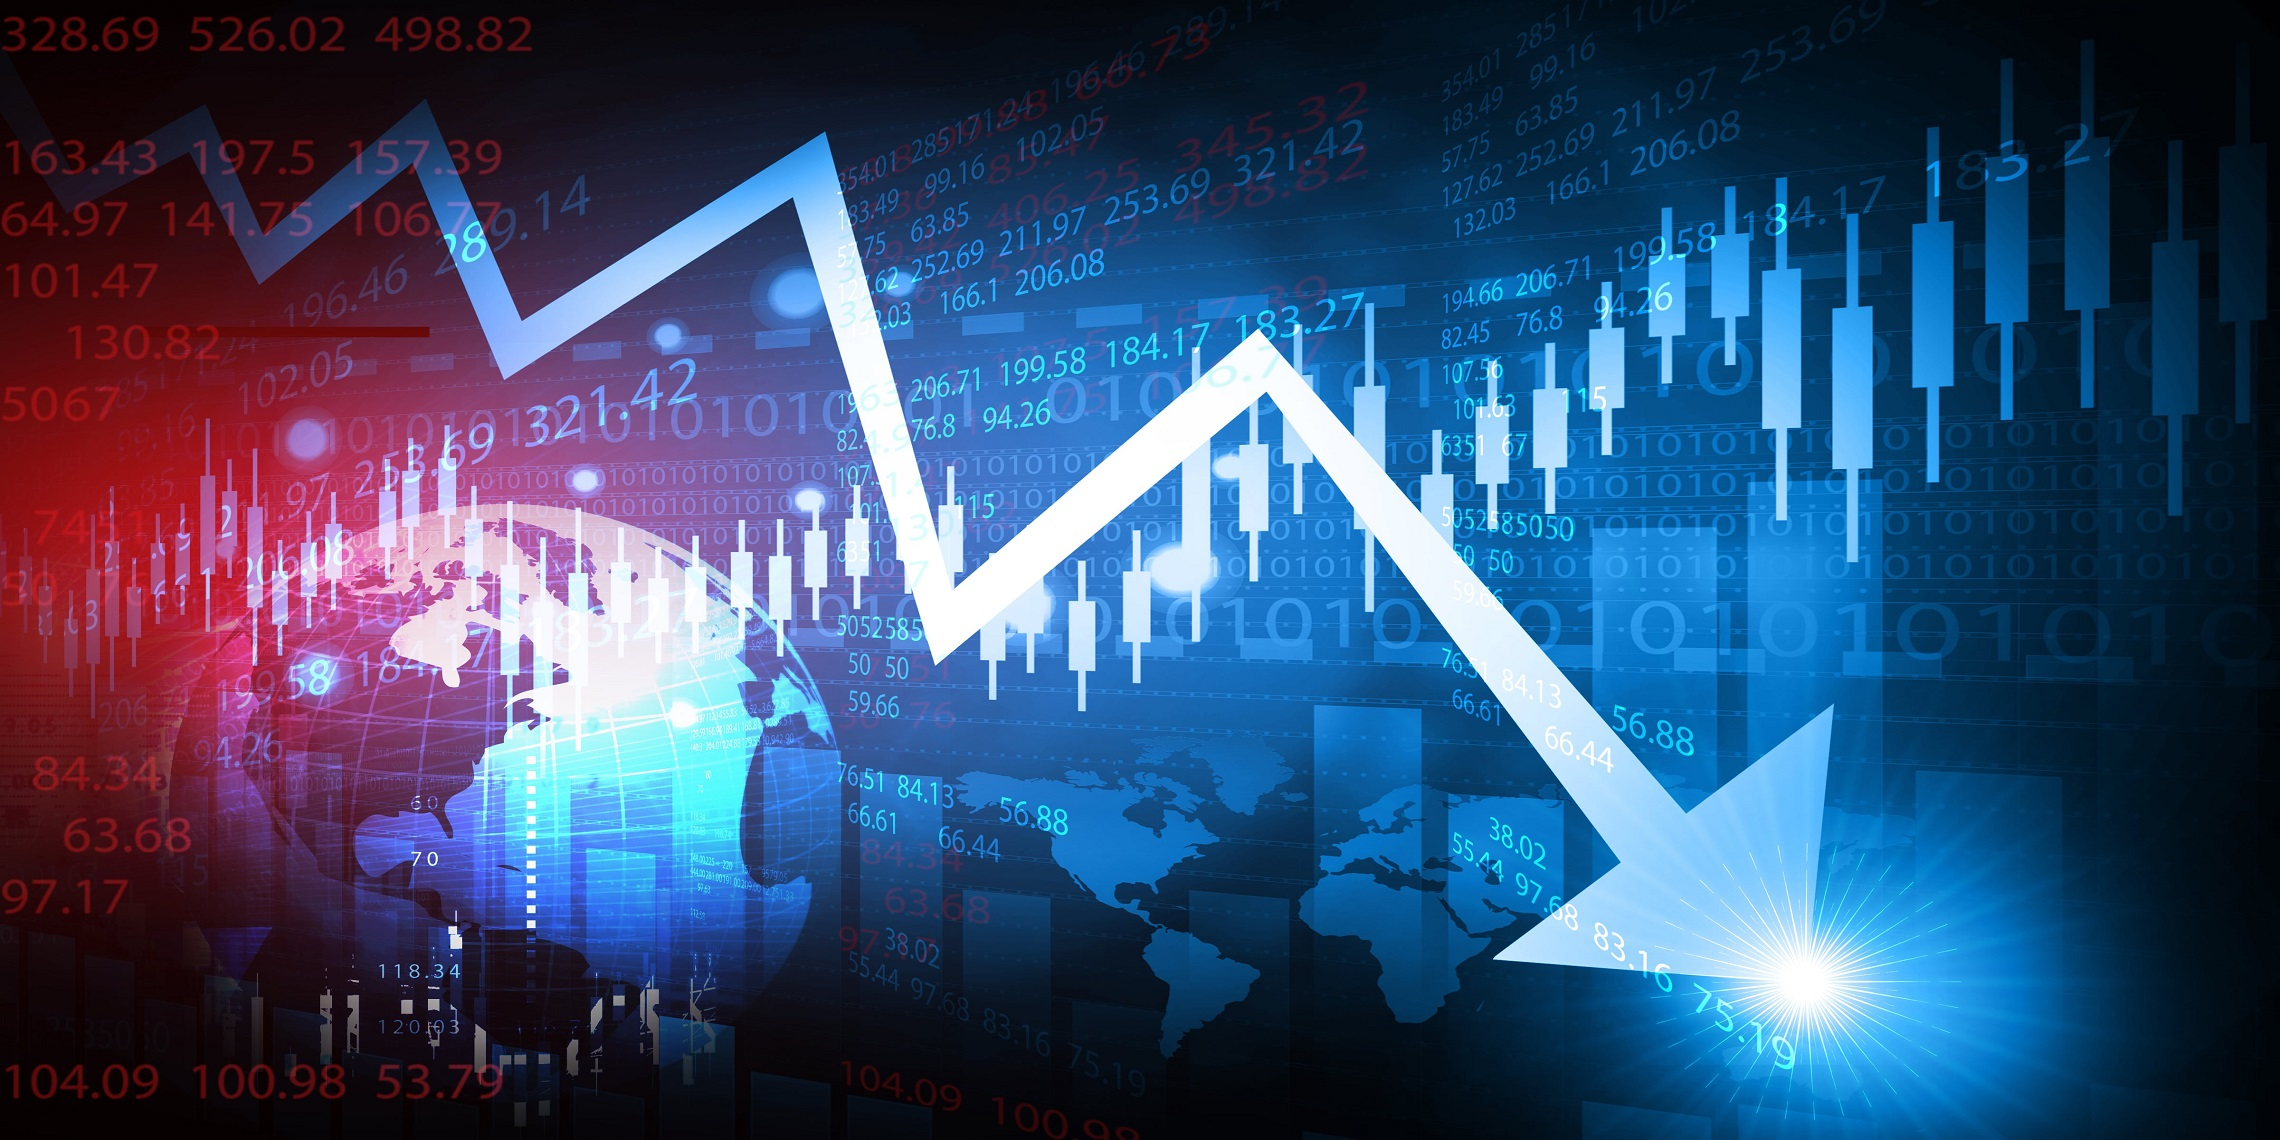 Plymouth Title Guaranty Corporation March 2020 Market Updates Stock Market Crash